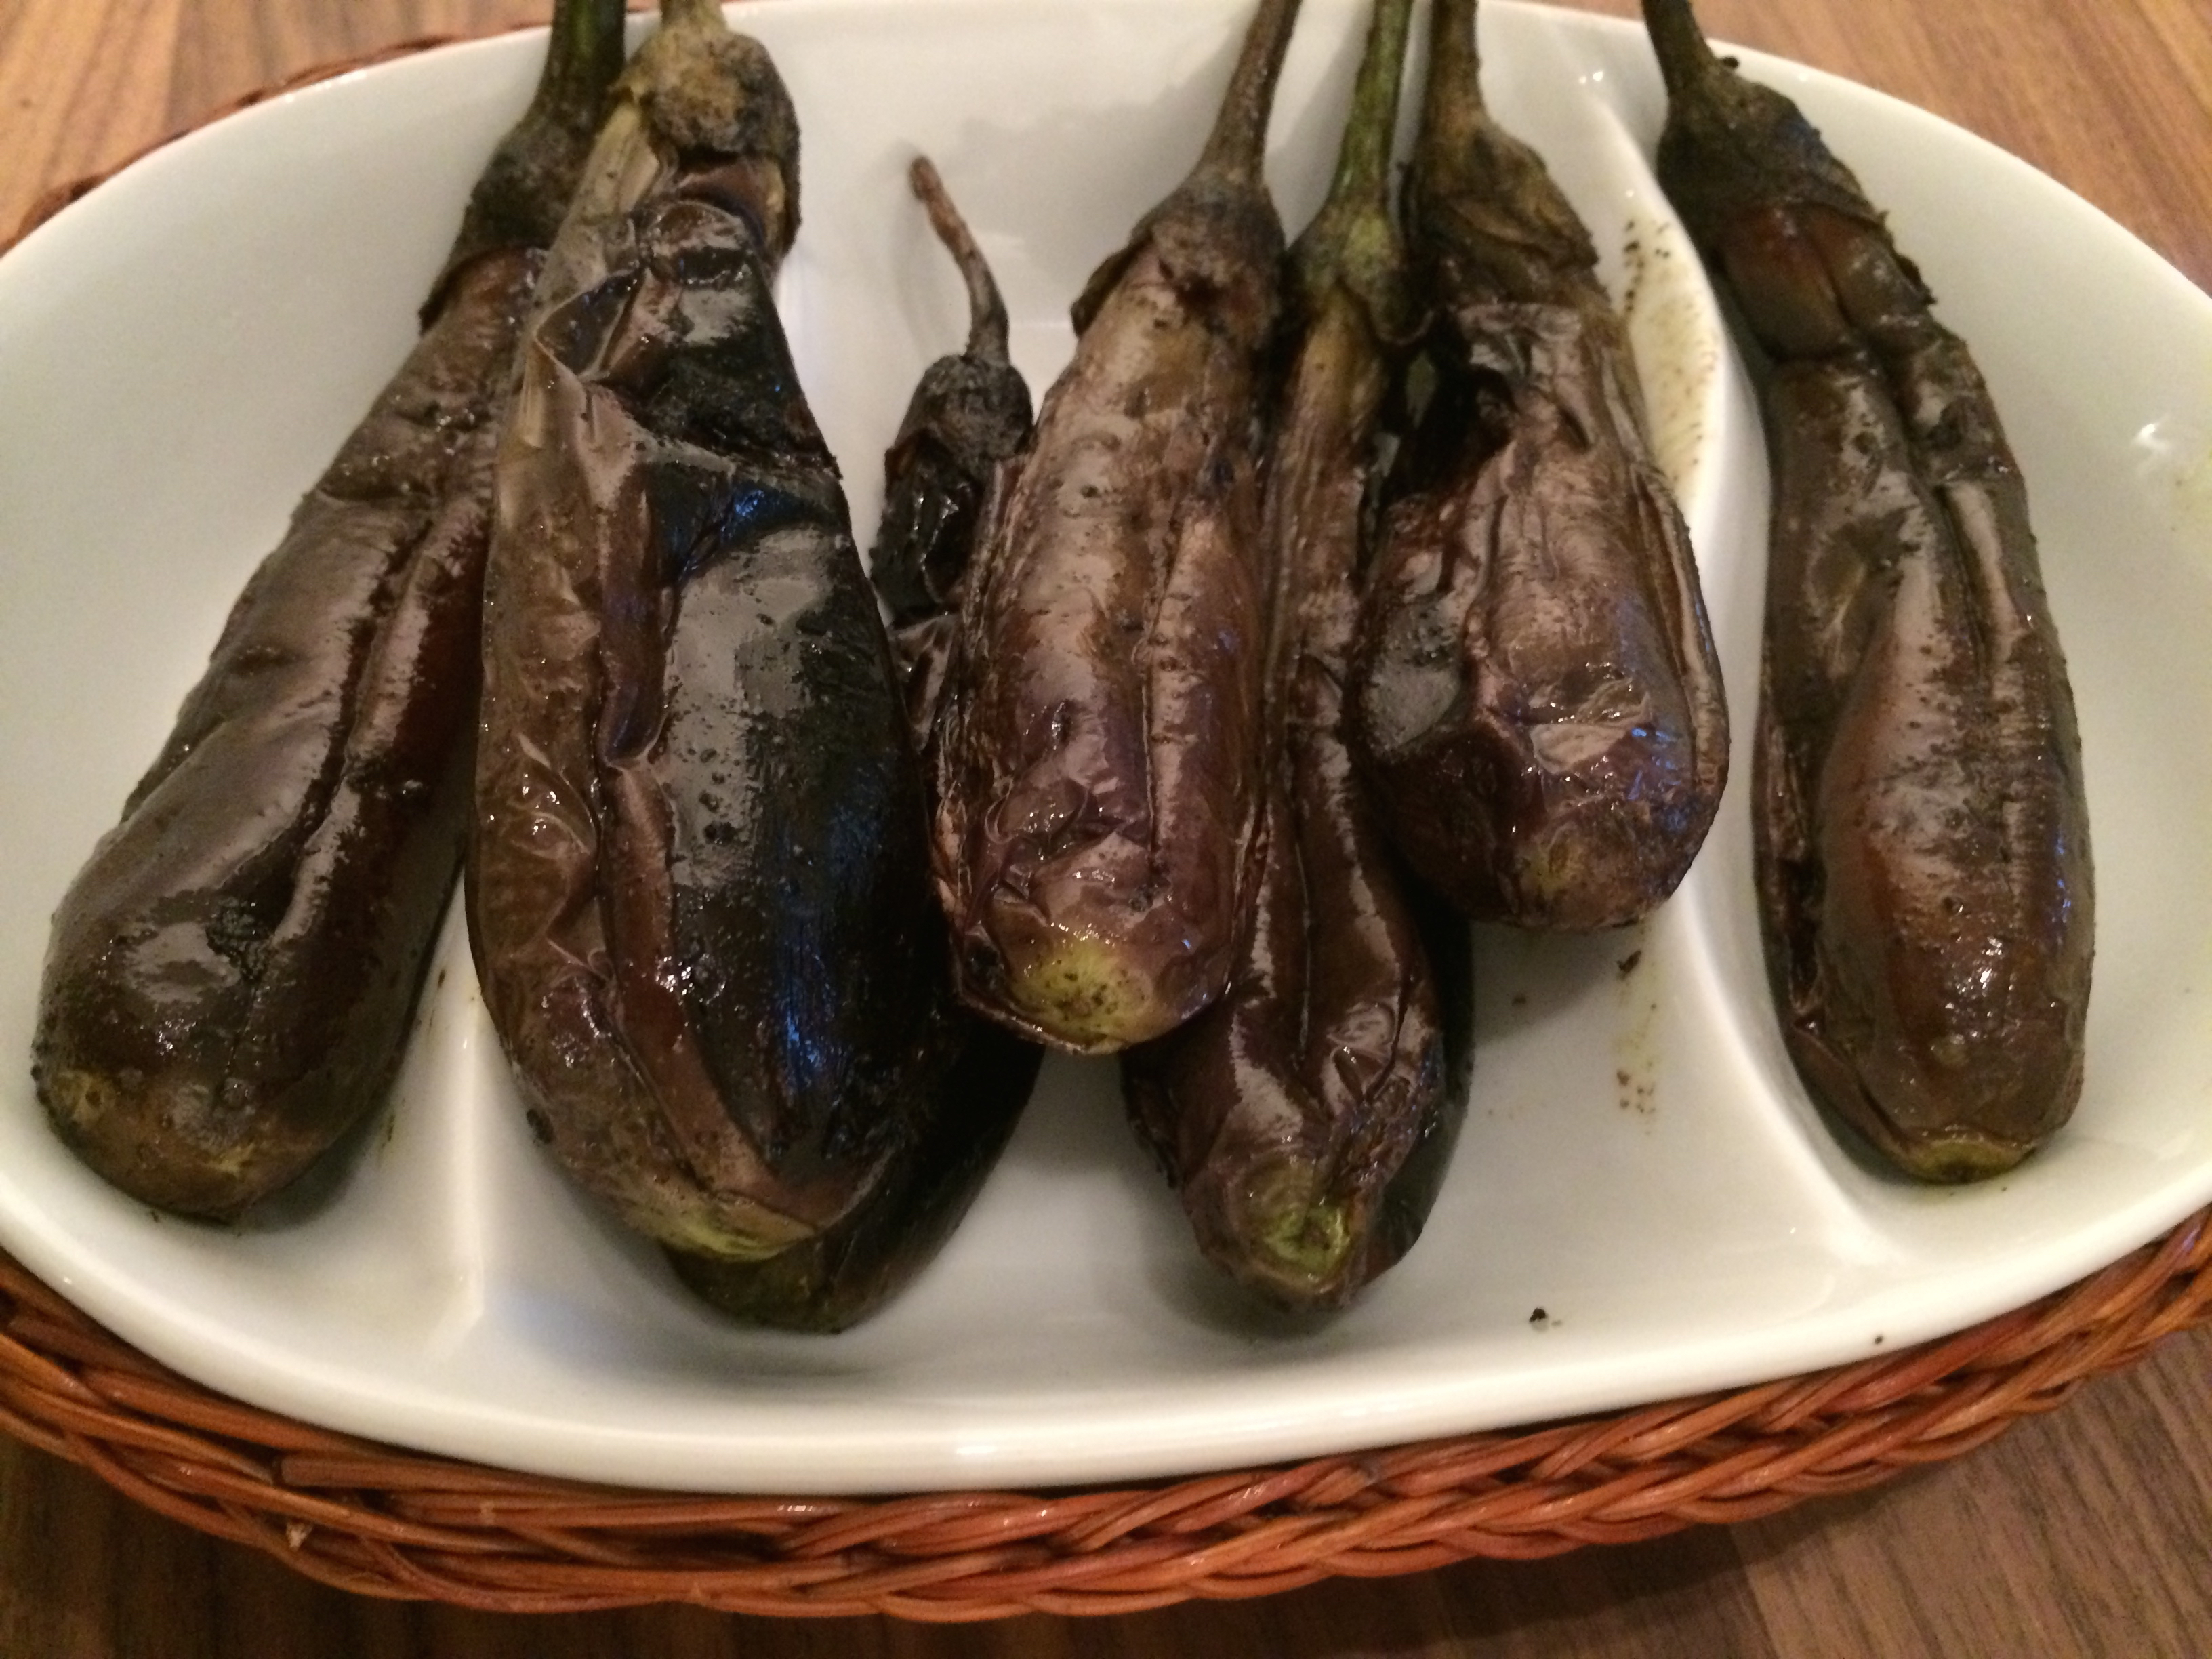 Bharwan bainga- masalafylte auberginer